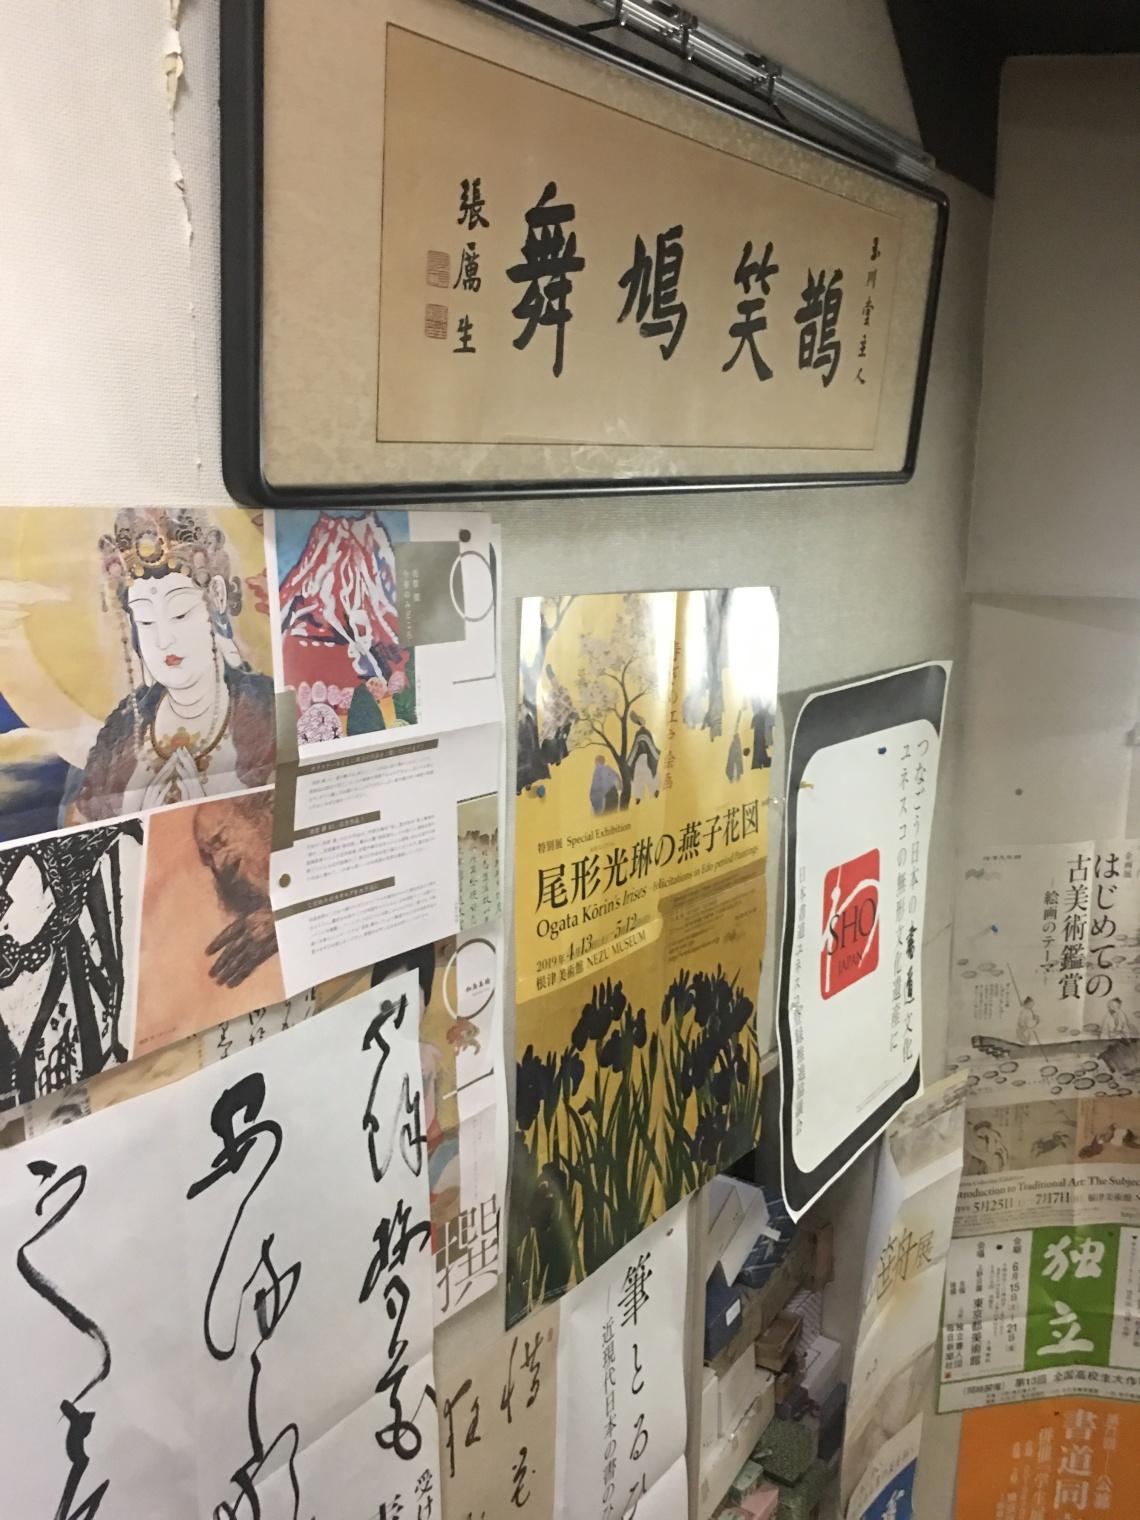 玉川堂 九段下 Calligraphy Art Store 3